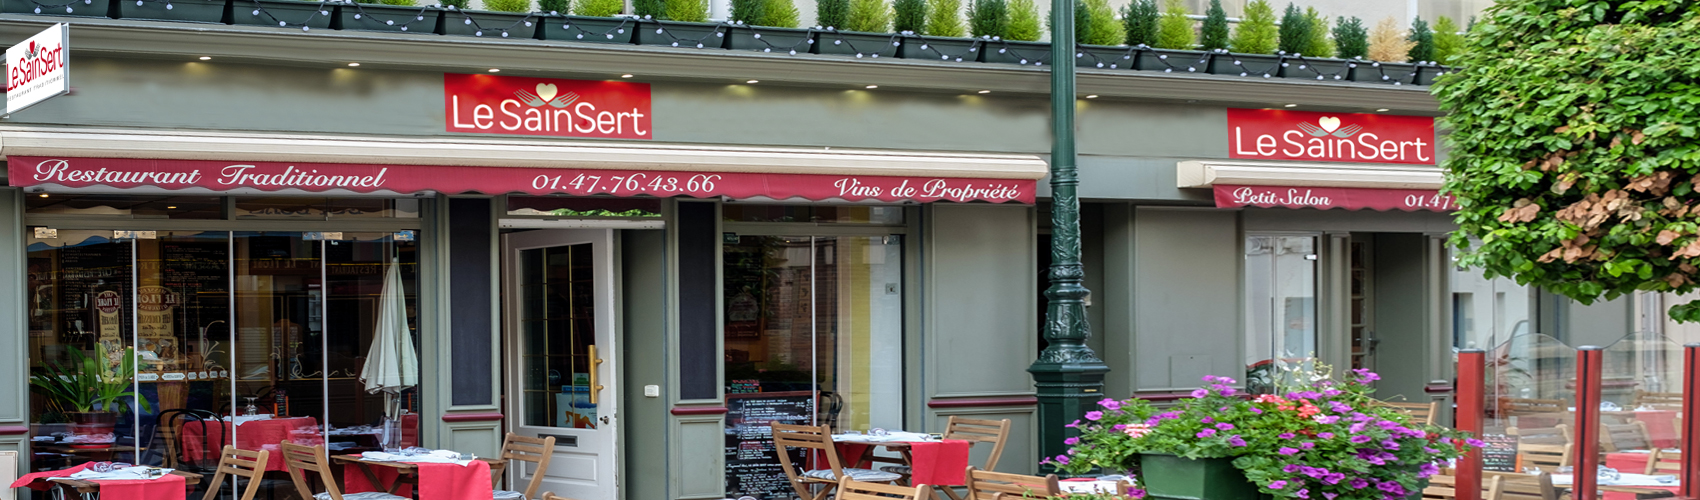 restaurant-lesainsert-facade